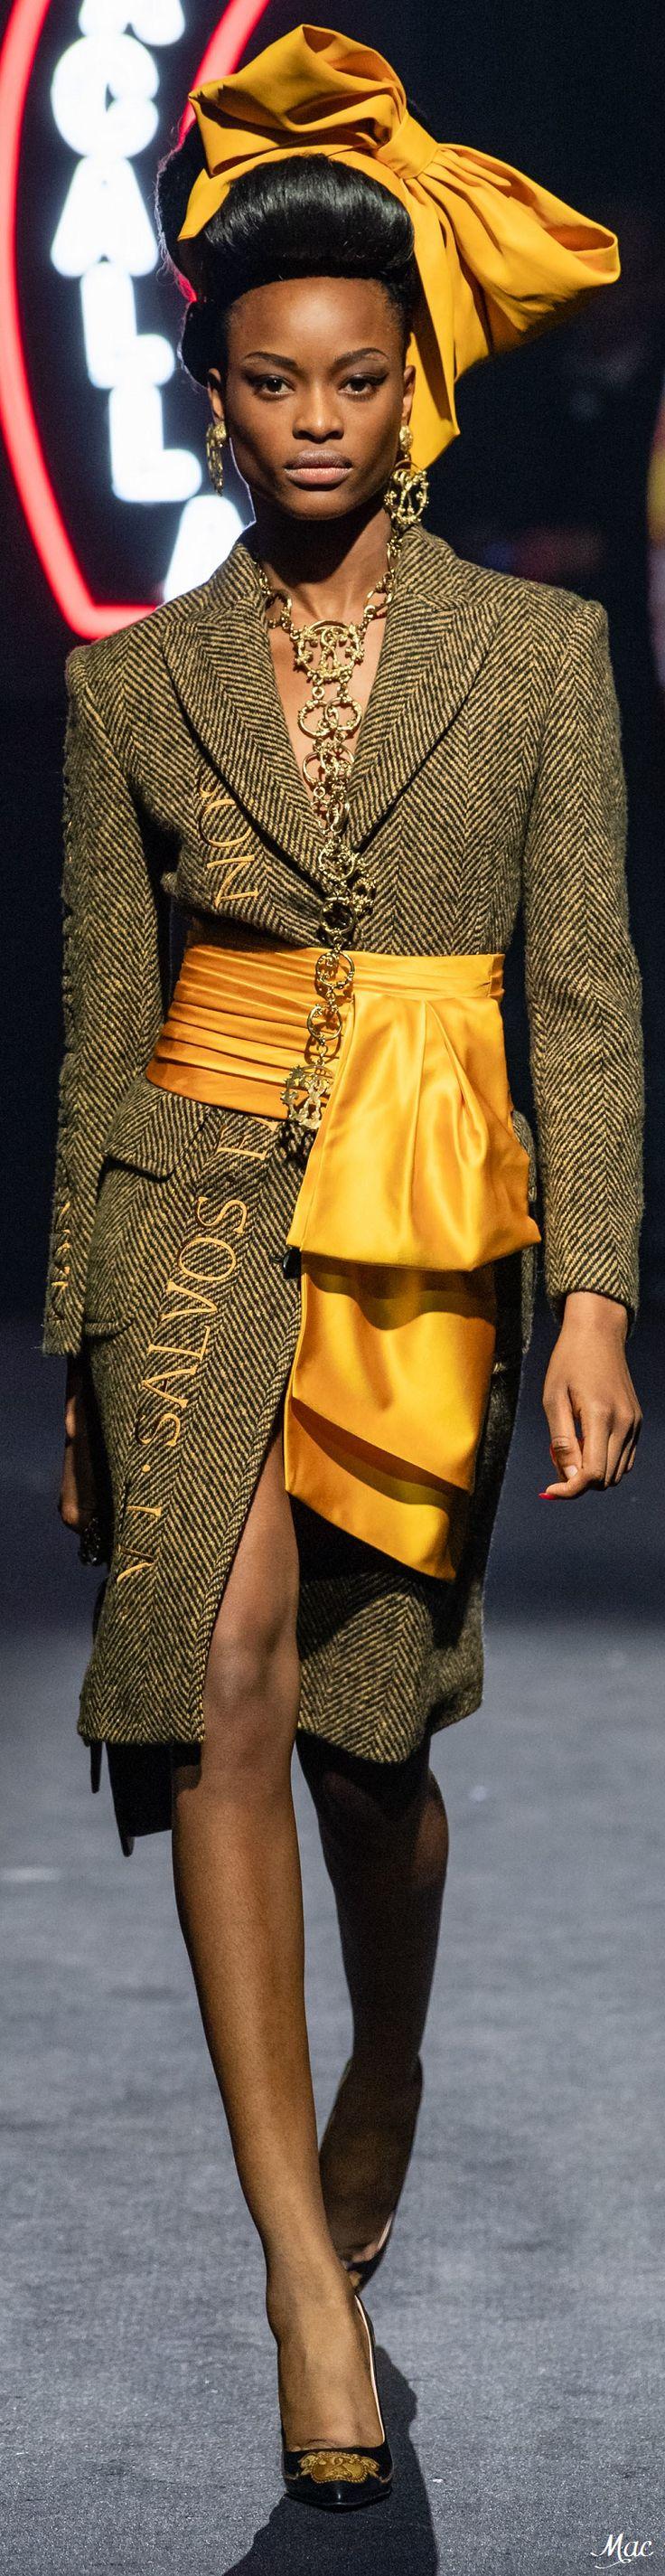 Moschino Pre-Fall 2019 #prefall2019 #pf2019 #fashionshow #womenswear #mode2019